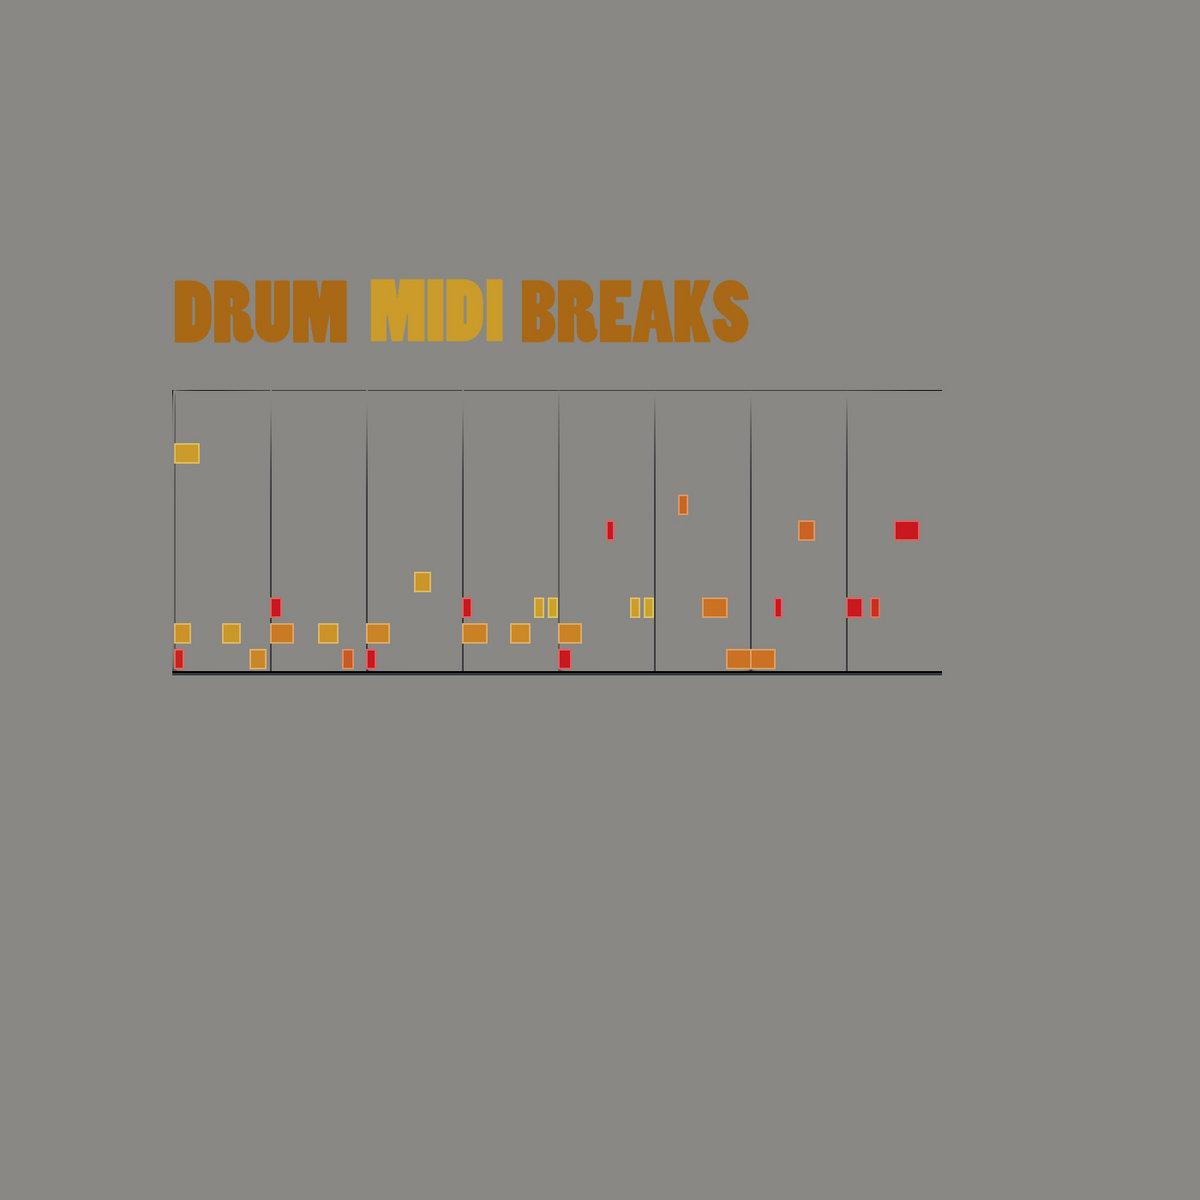 DRUM BREAKS in MIDI (free) | mpc head